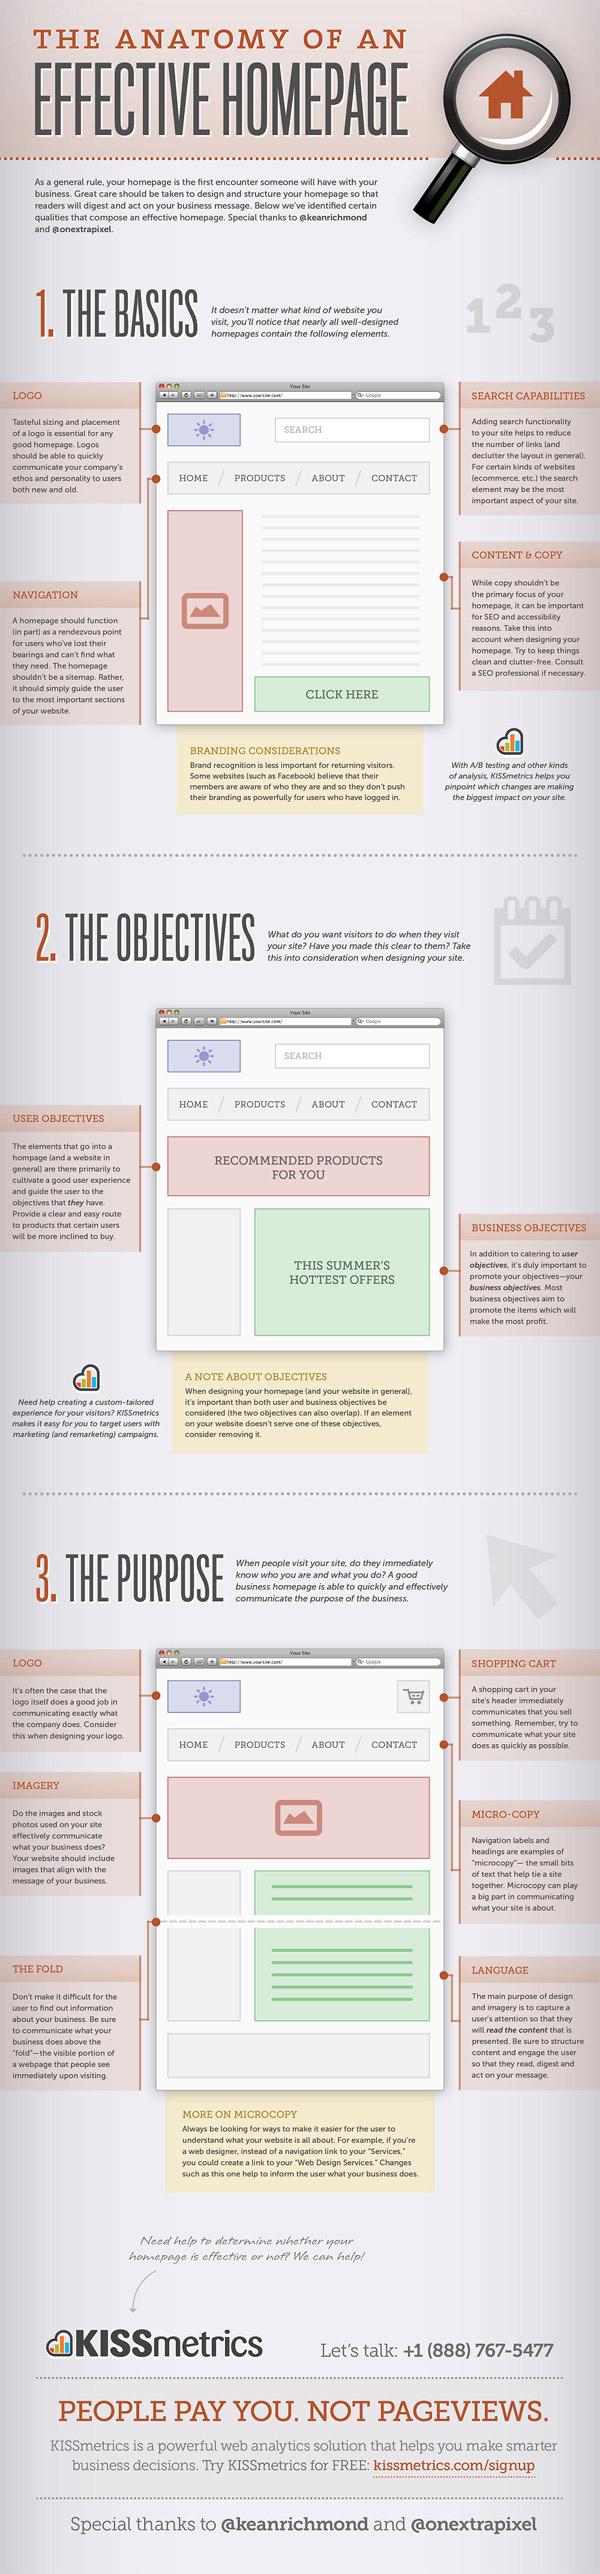 The Anatomy of an Effective Homepage by KISSmetrics